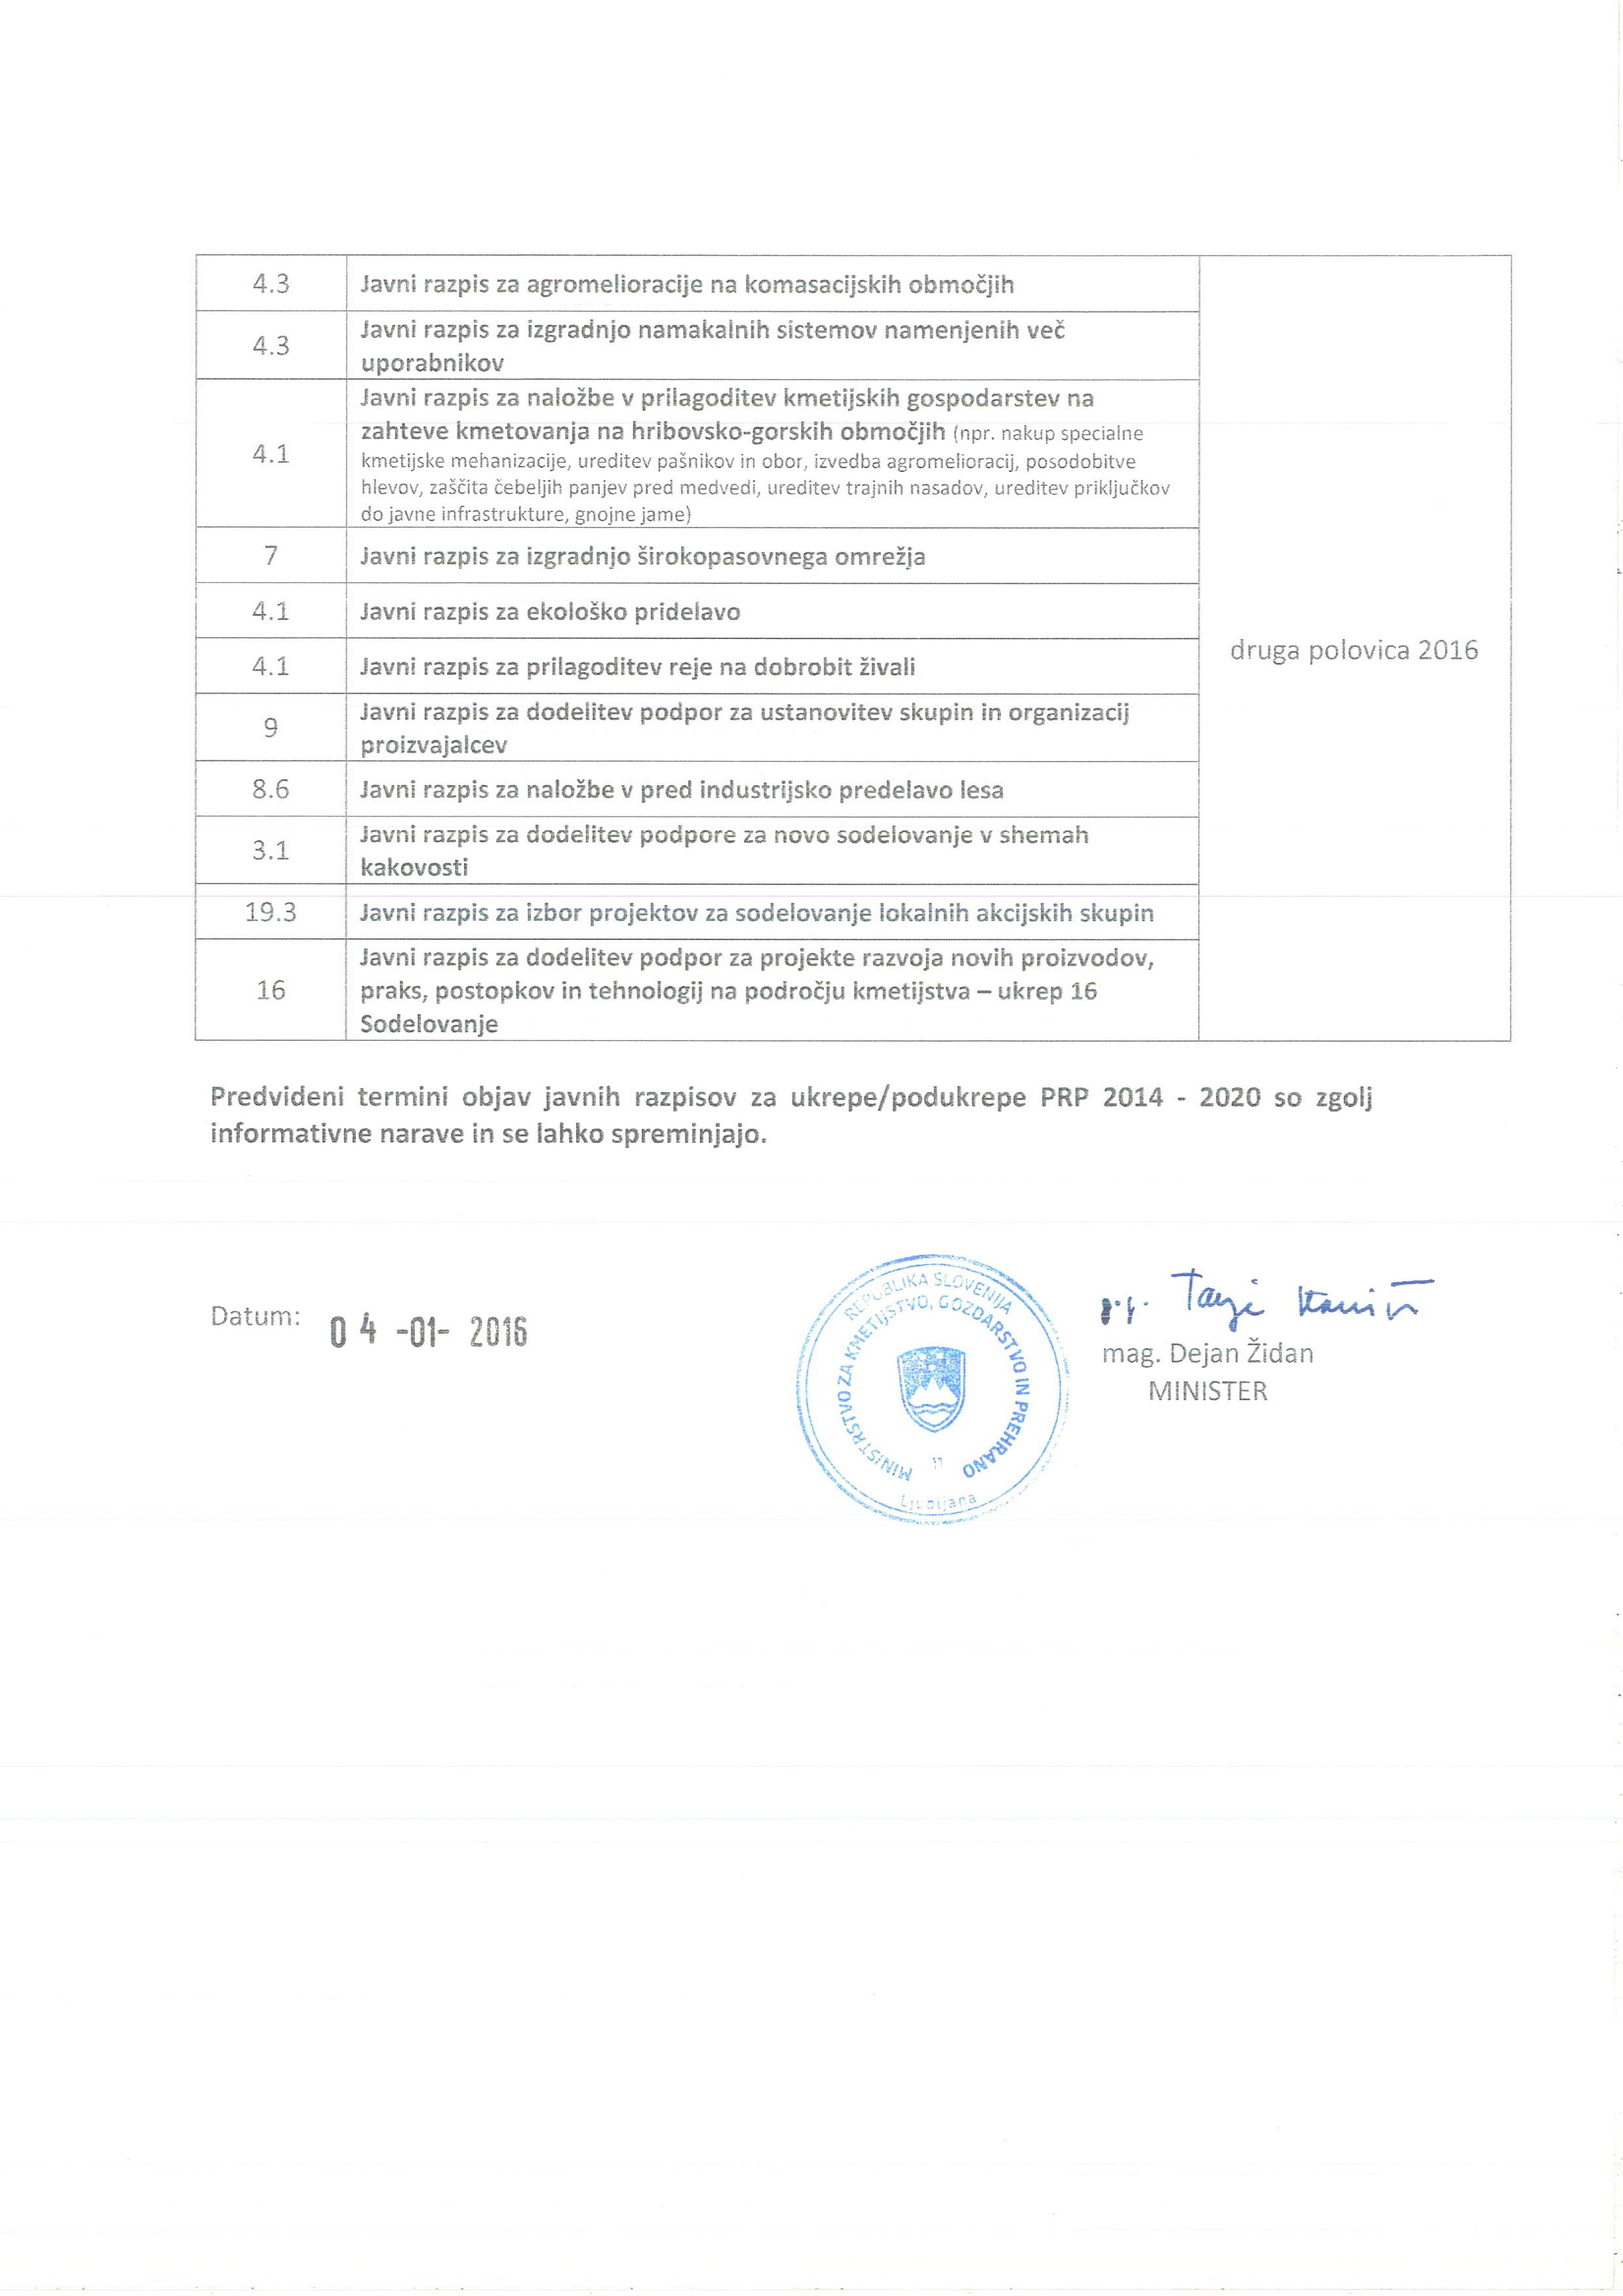 2016_1_4_Okvirni_terminski_nacrt_JR_PRP-2